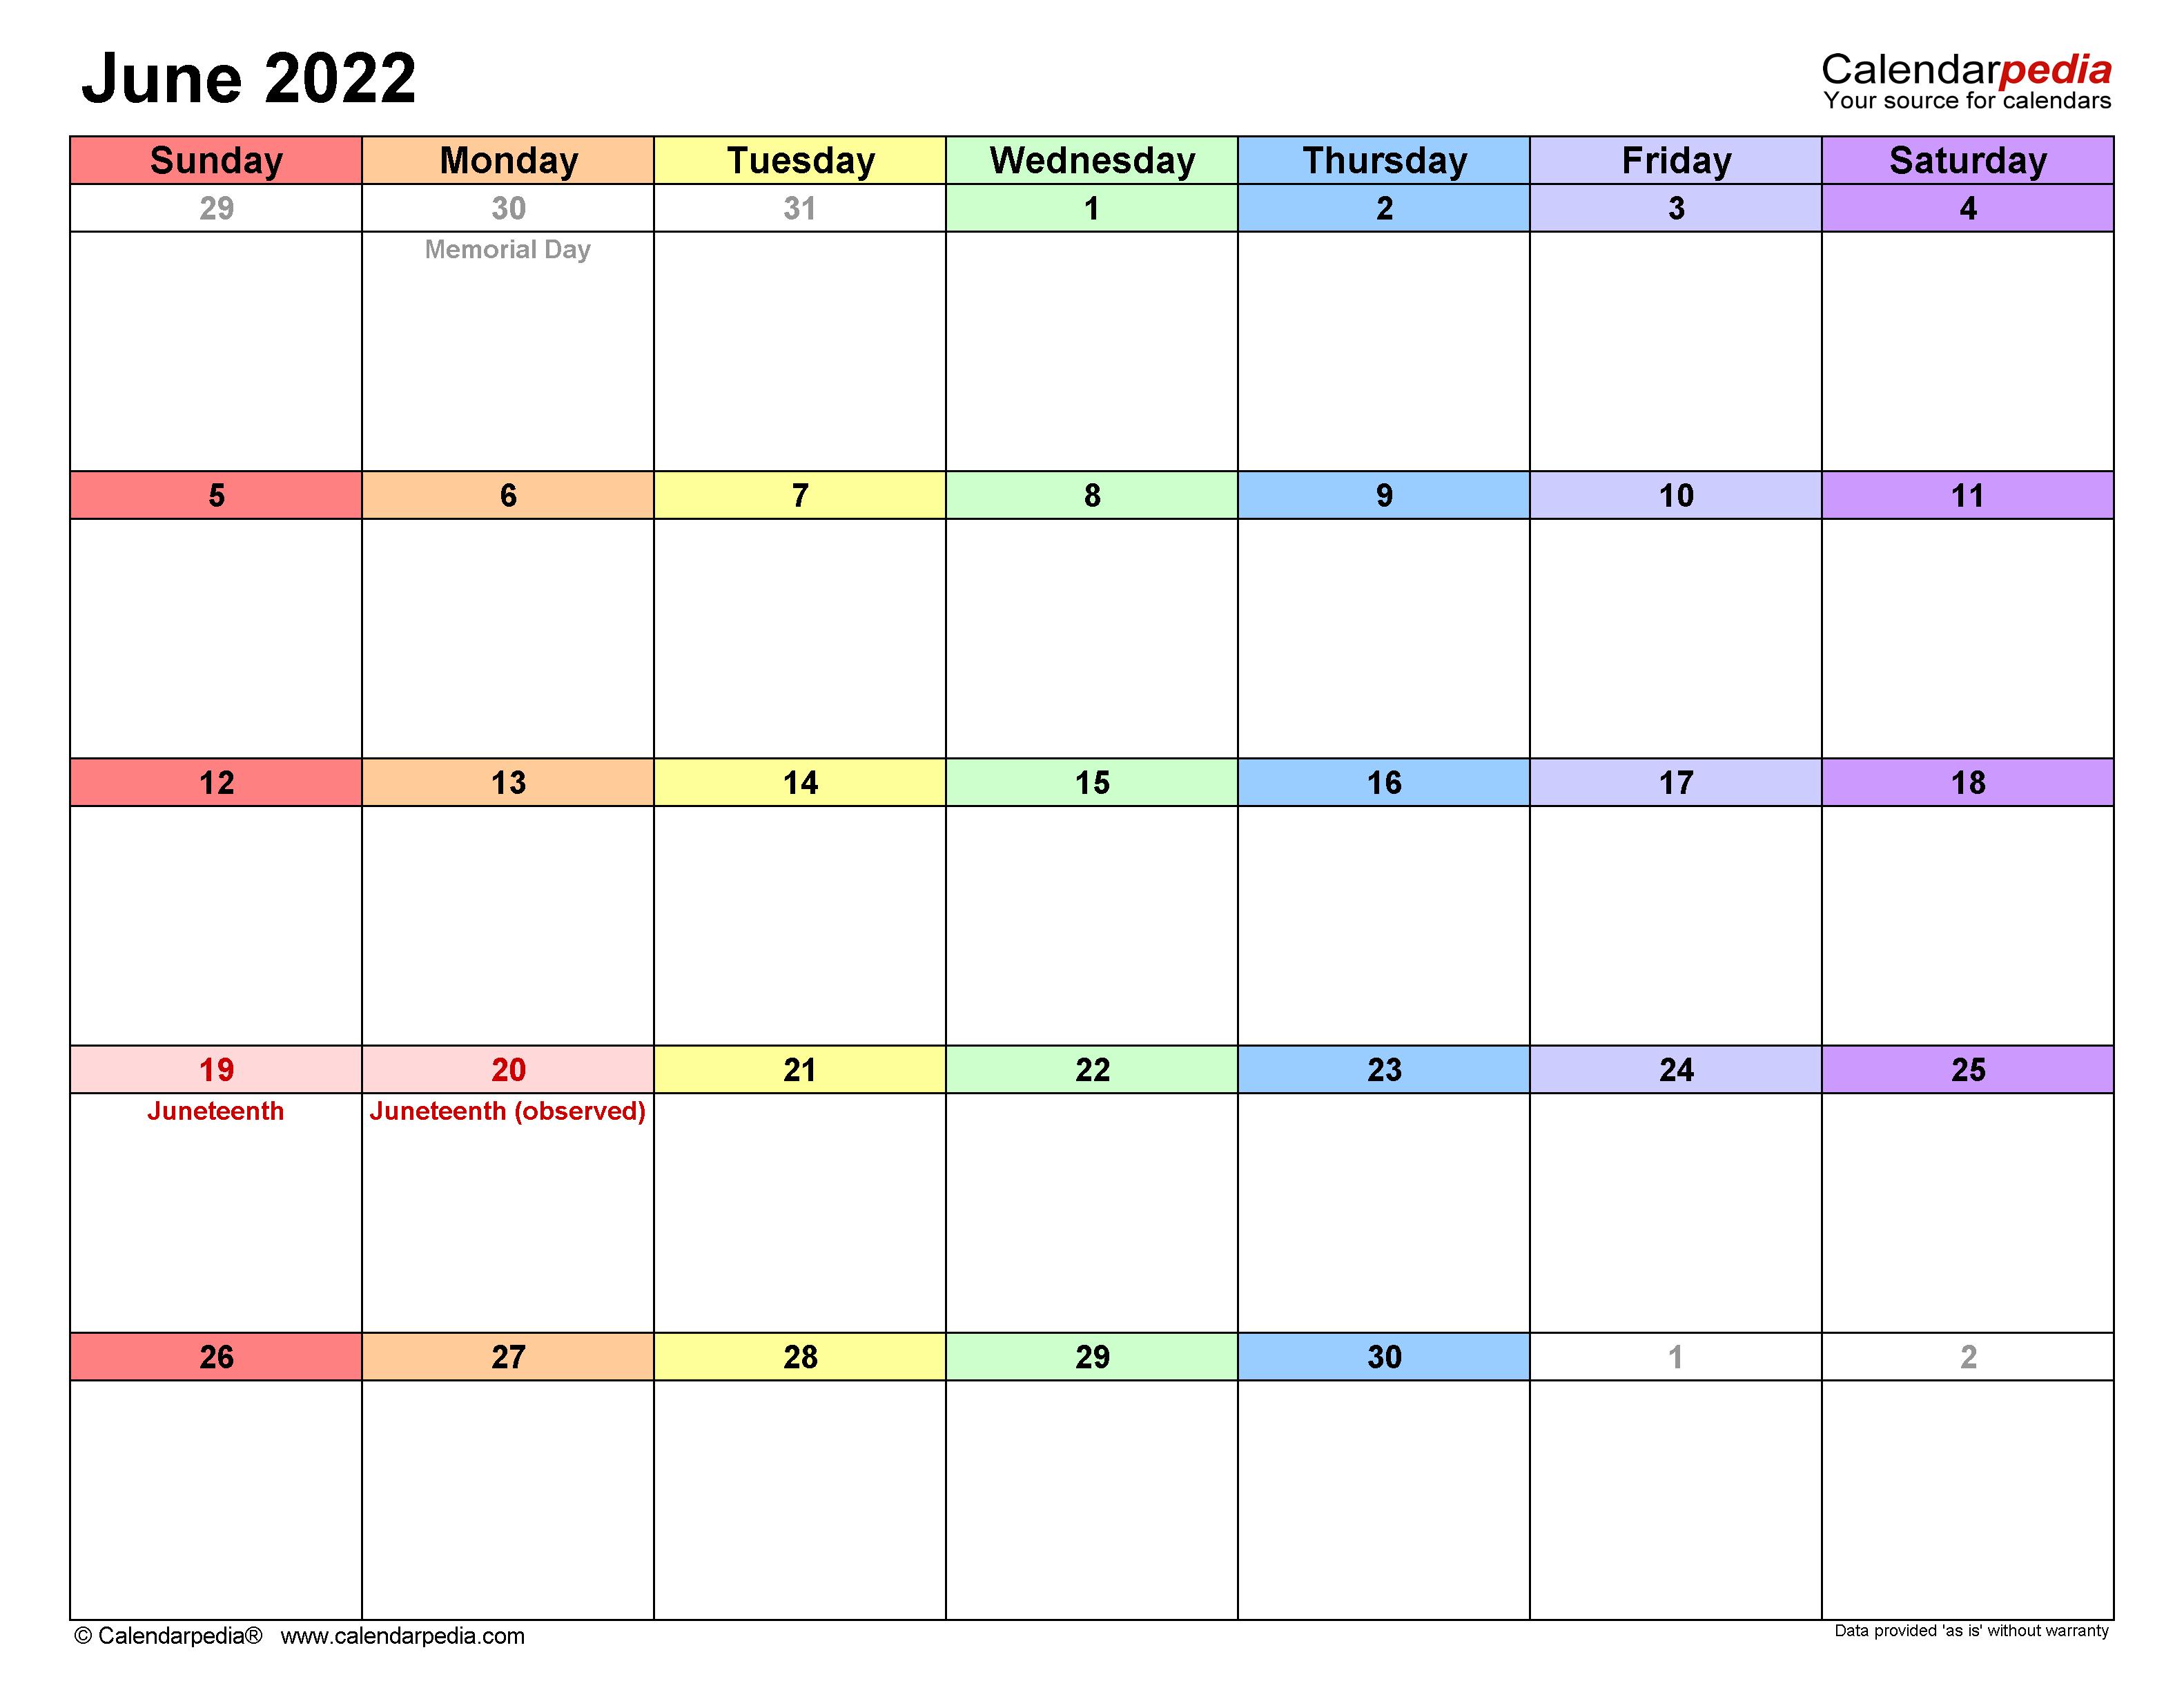 Marketing Calendar 2022.June 2022 Calendar Templates For Word Excel And Pdf